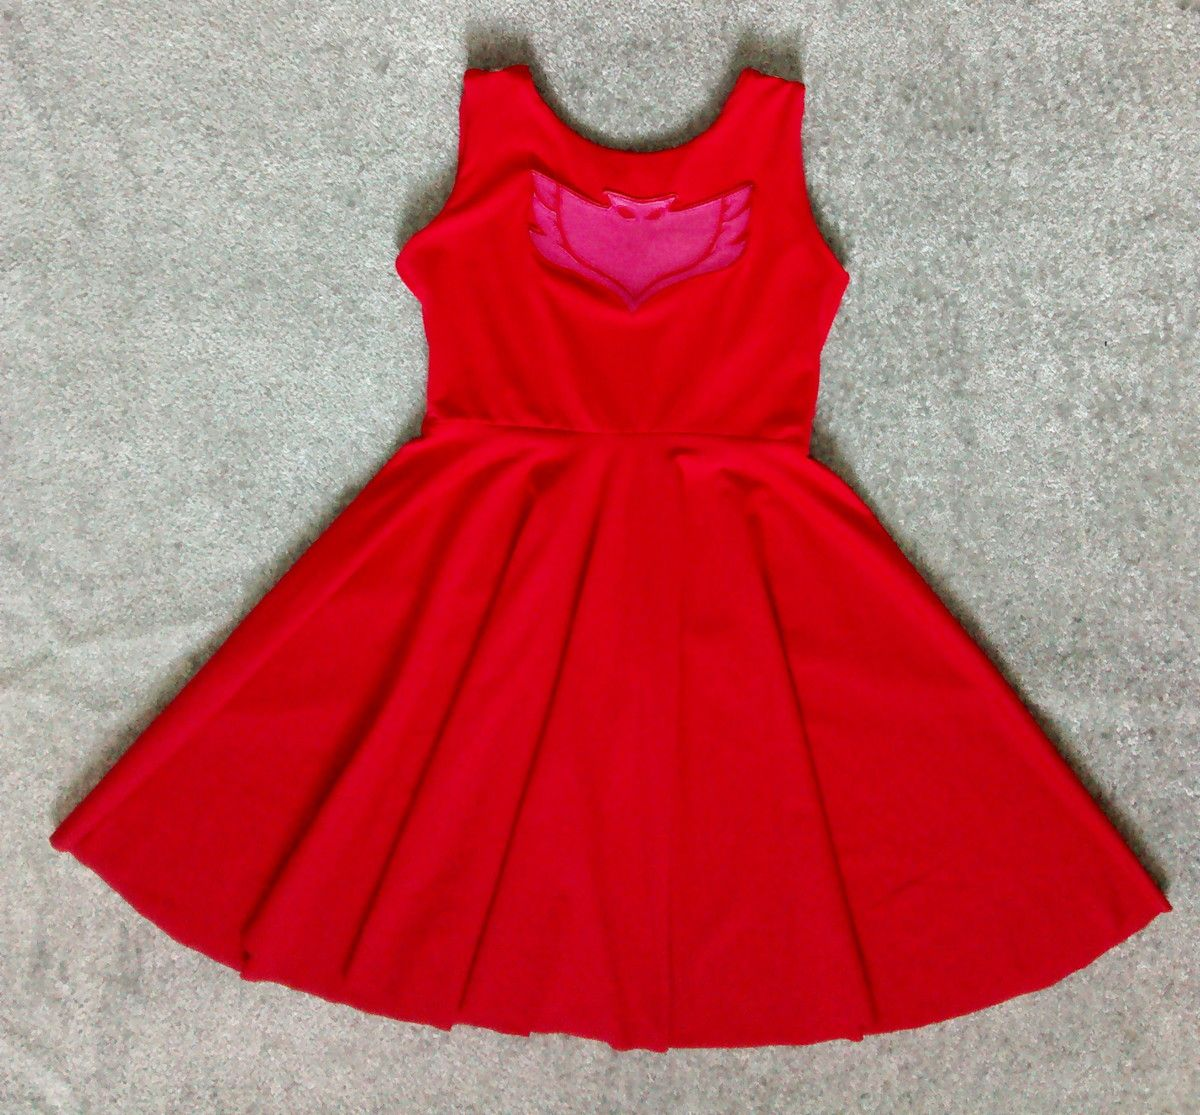 Vestido Corujita PJ Masks Coi Coi Atelier infanti   Hanna s board in ... 03095d0d7cd